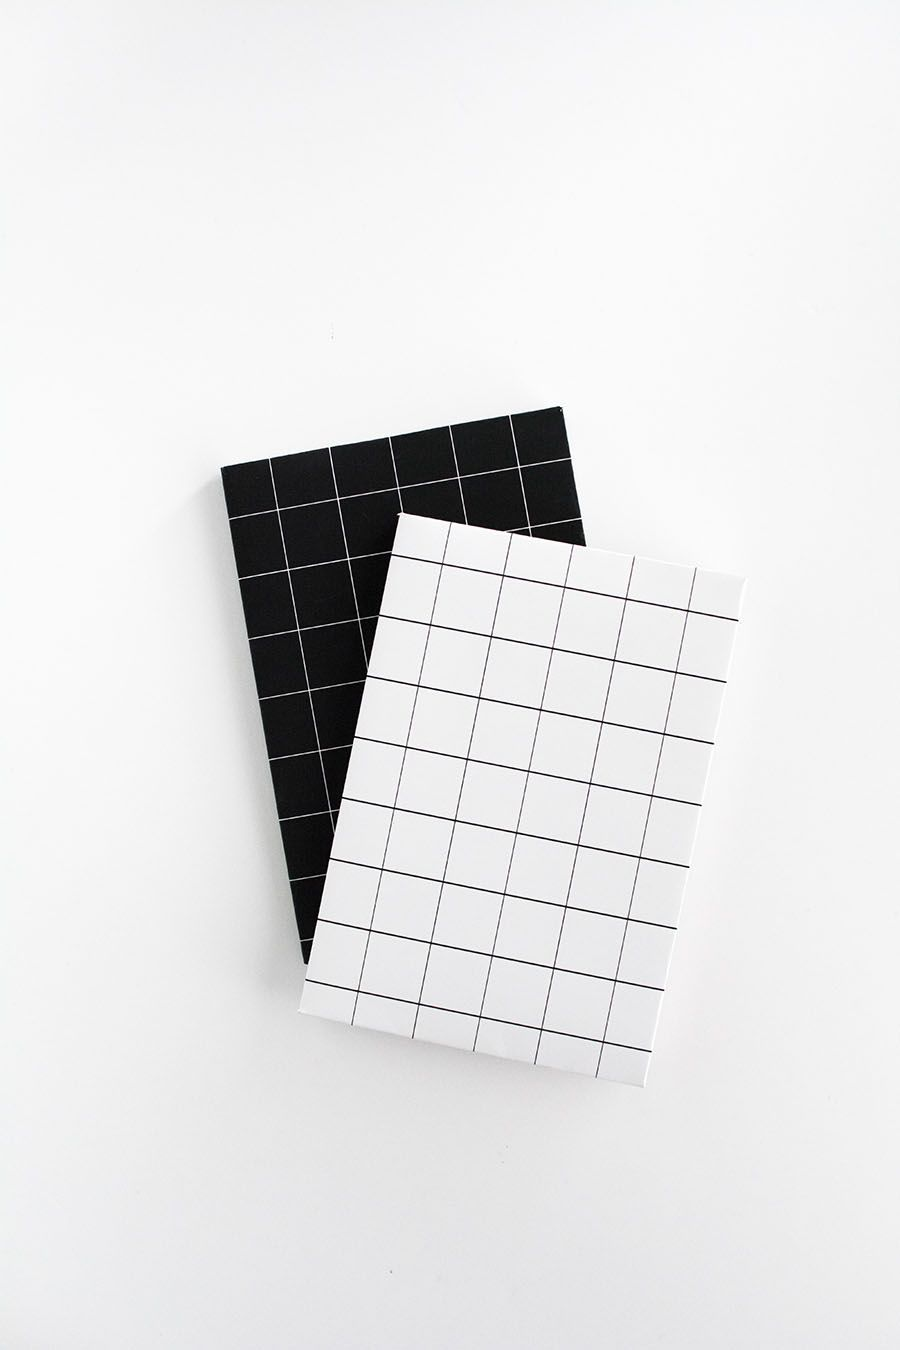 Book Cover Design Grid : Diy grid notebook covers free printable teach me